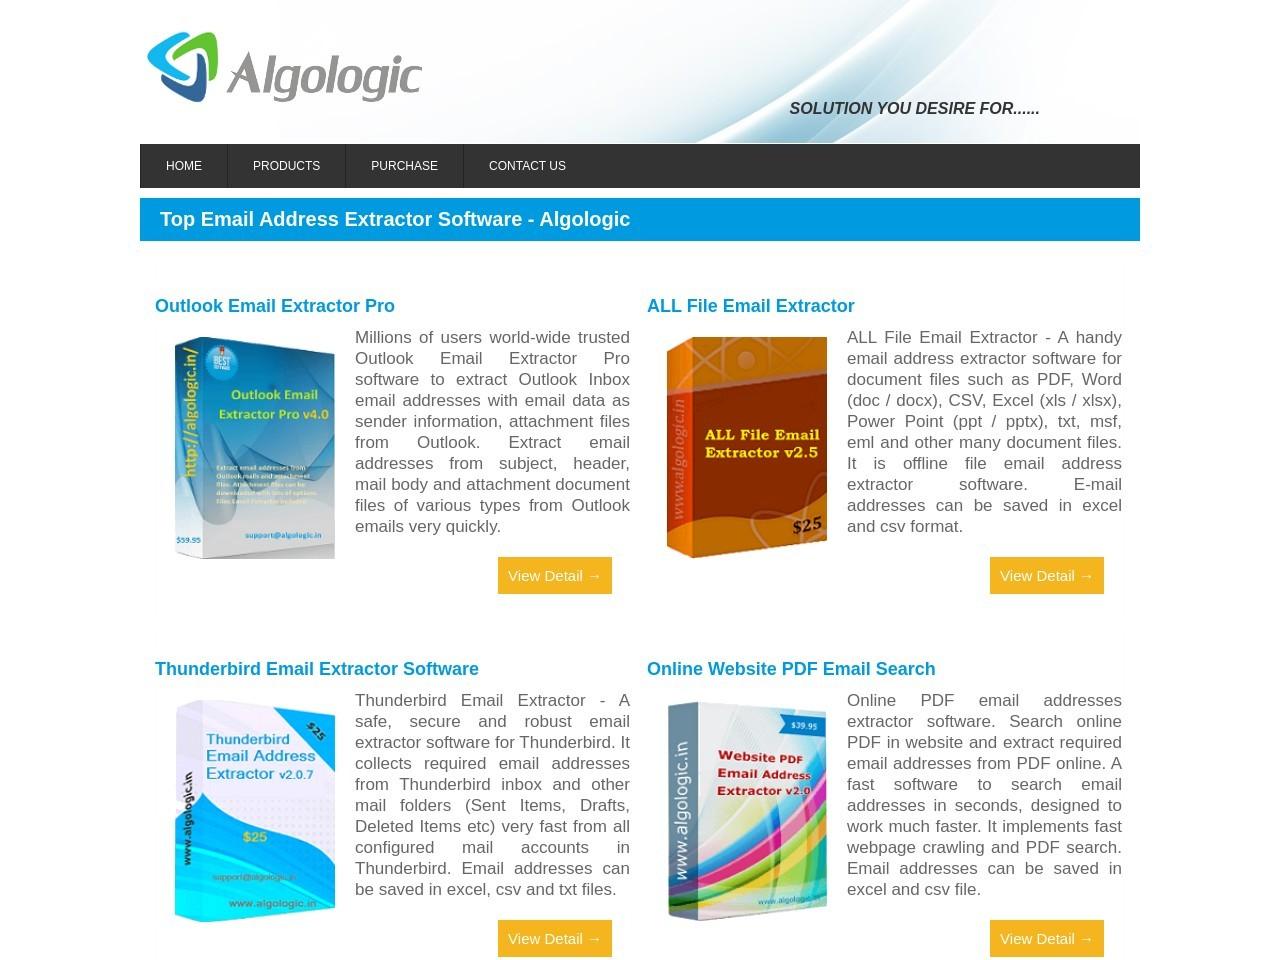 AlgoLogic